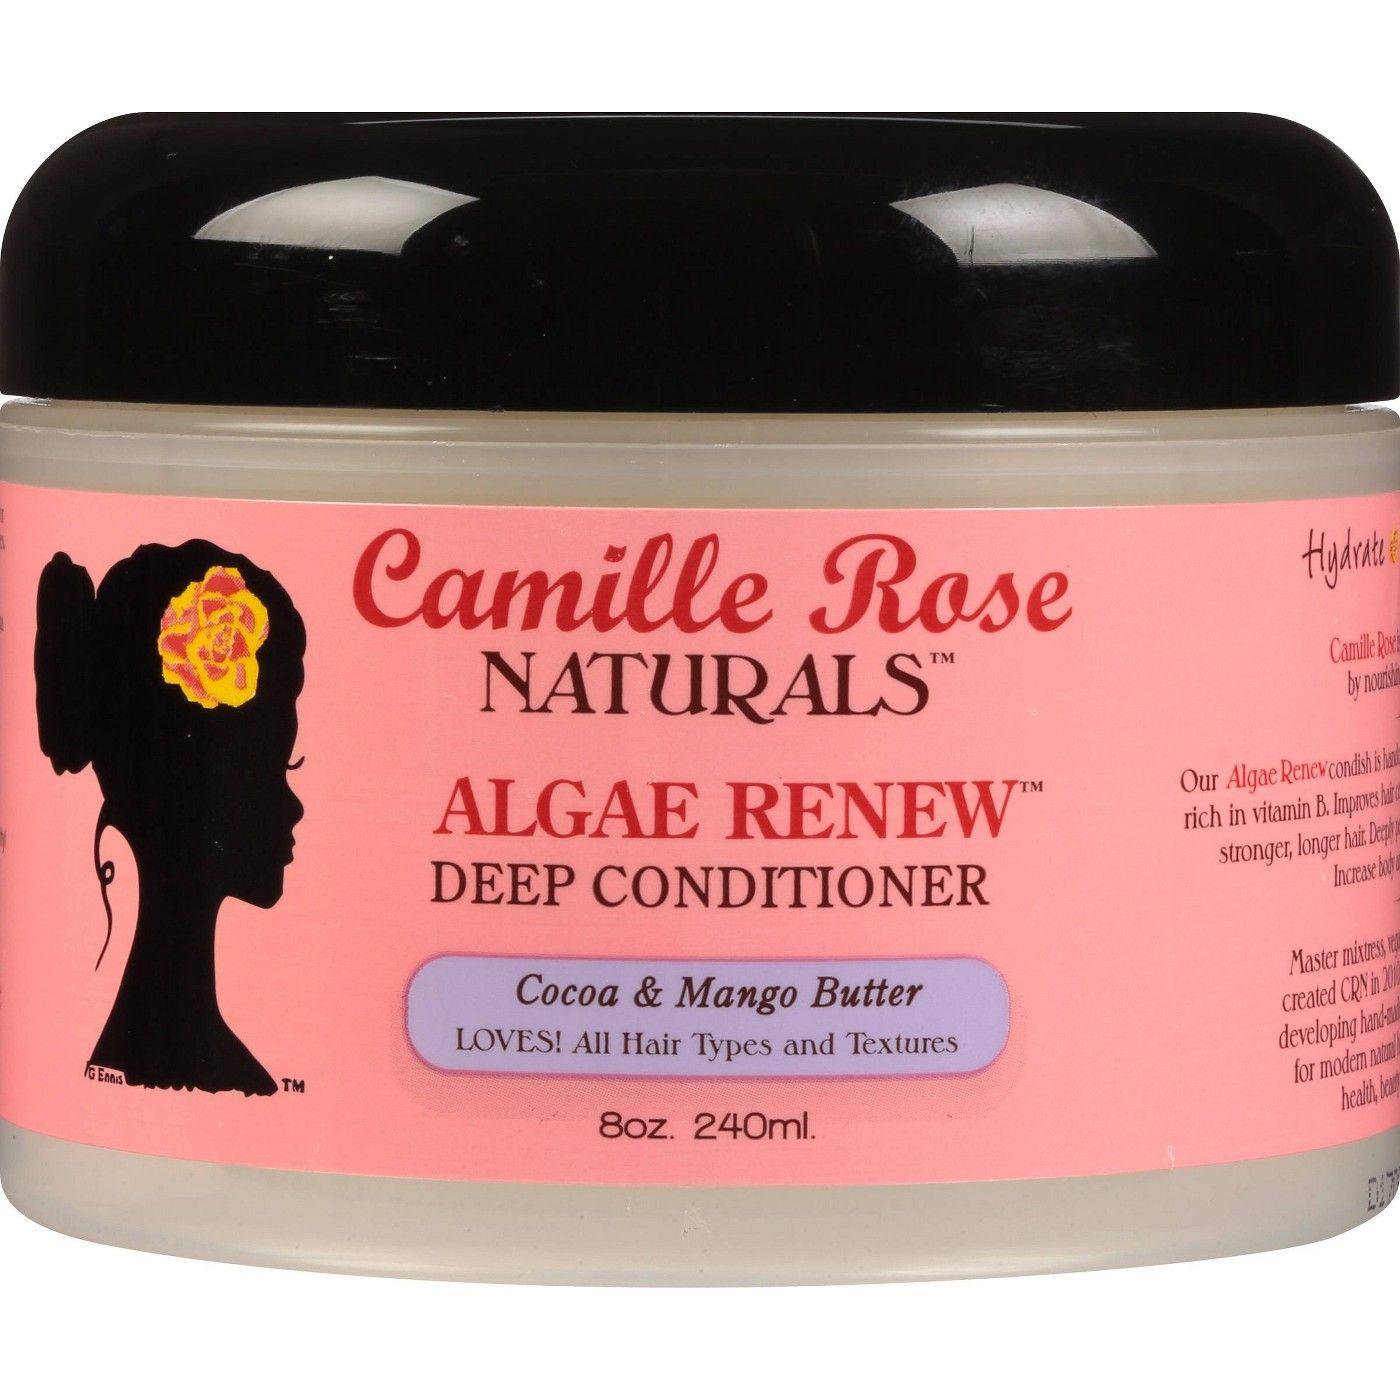 Camille Rose Algae Renew Deep Conditioning Mask 8oz in